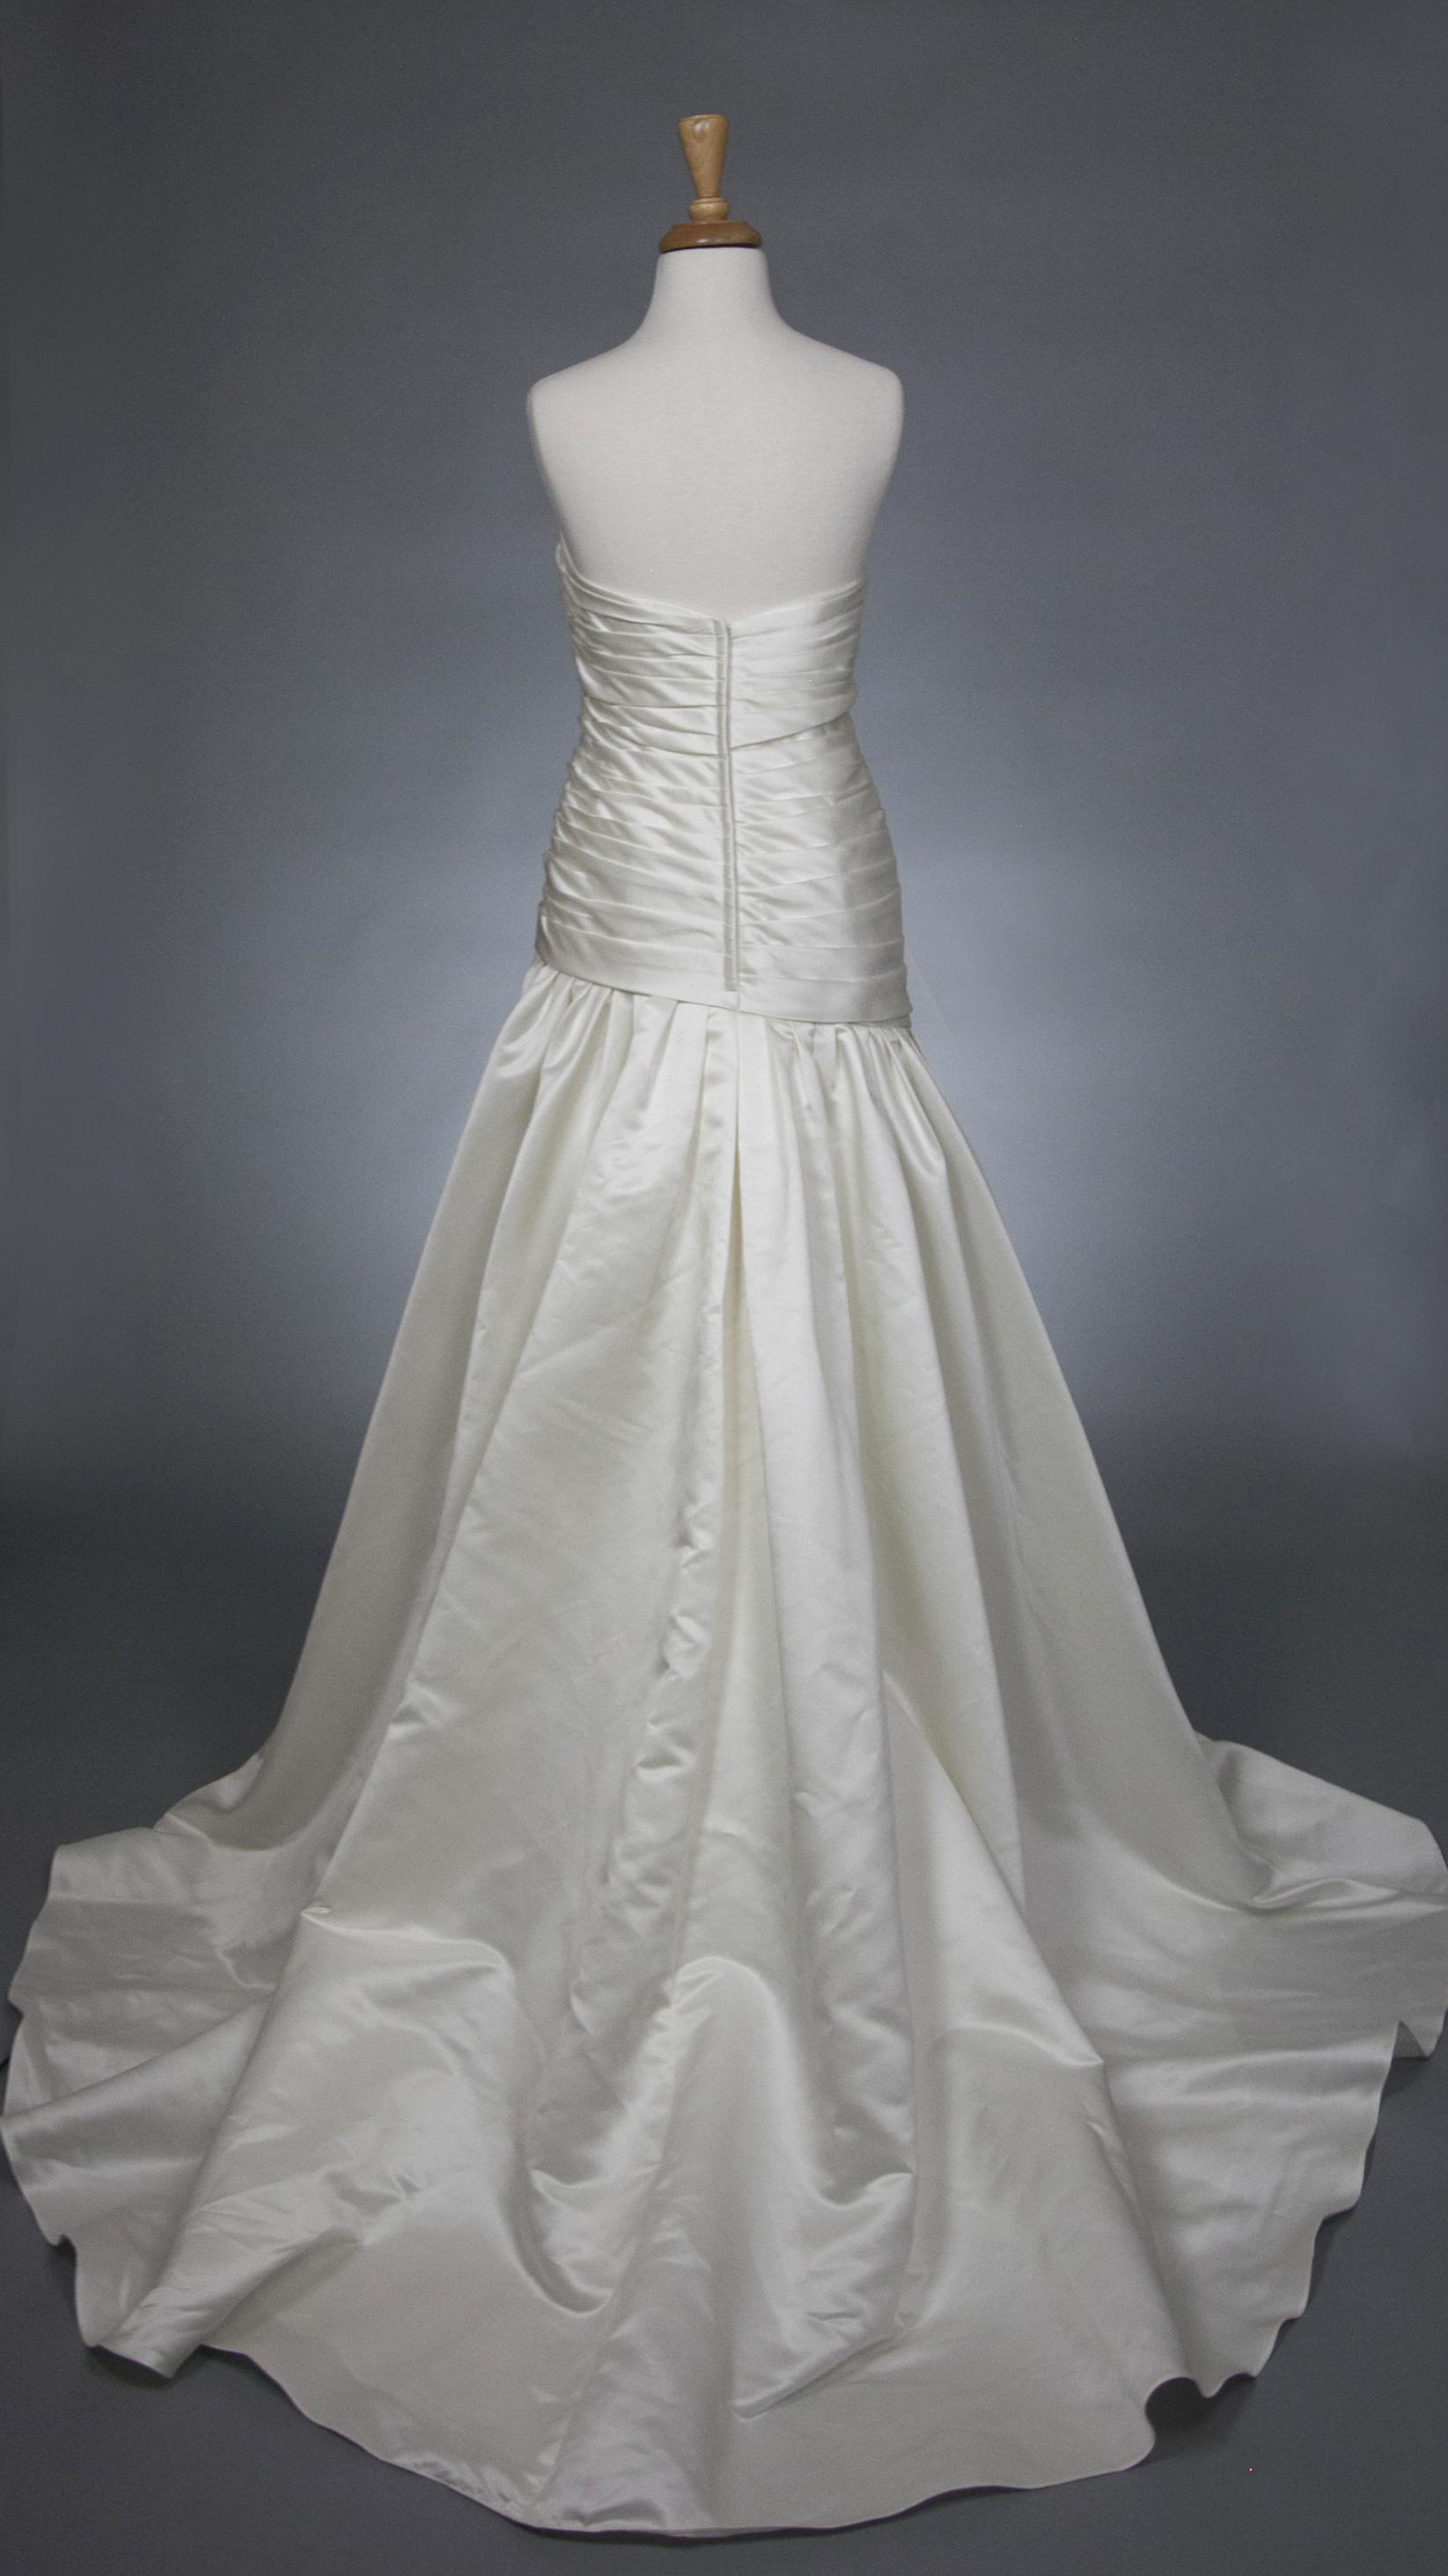 David's Bridal - 9MB3651  $275.